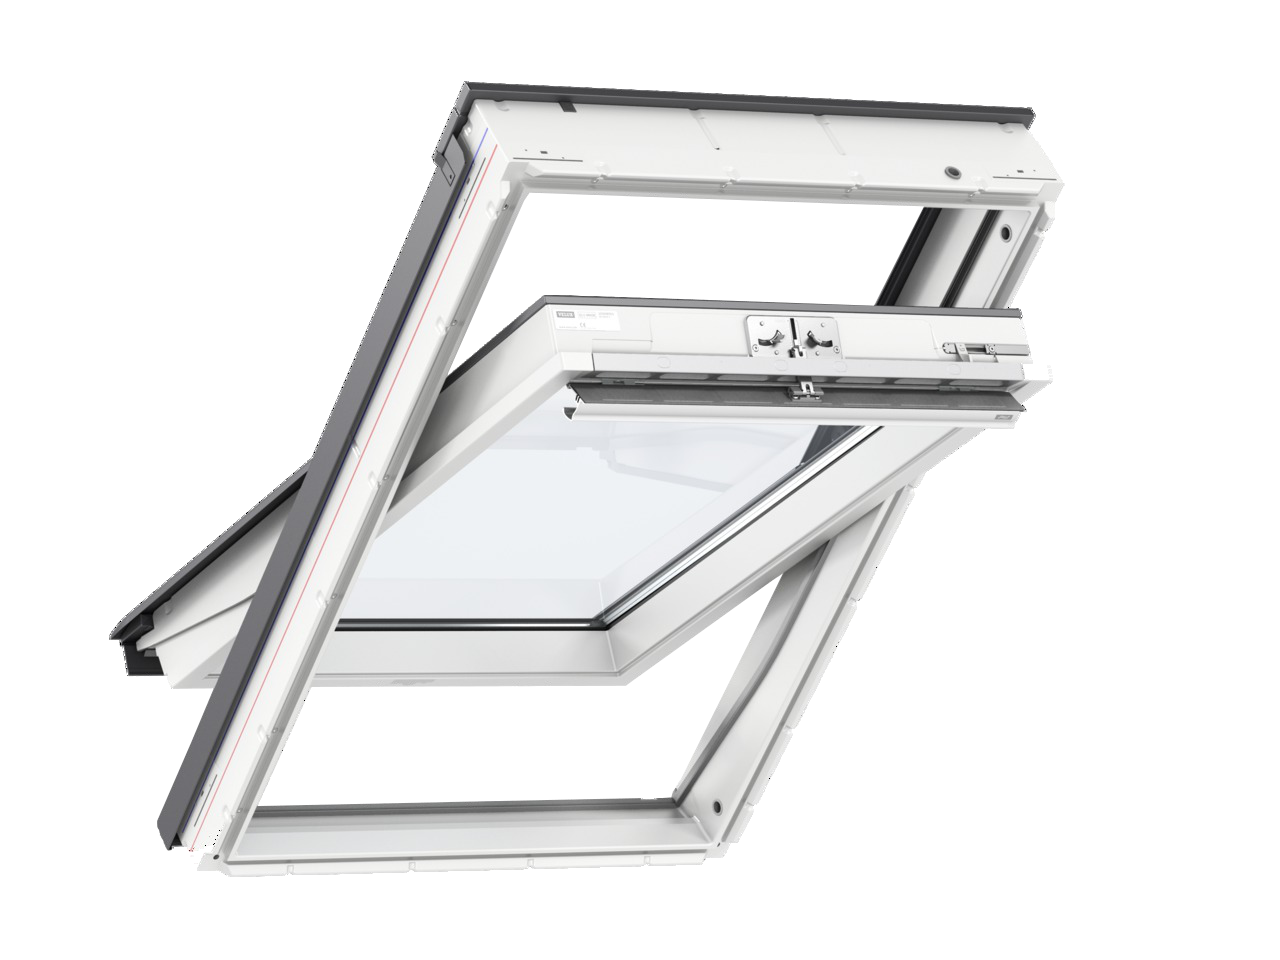 original velux dachfenster schwingfenster kunststoff. Black Bedroom Furniture Sets. Home Design Ideas